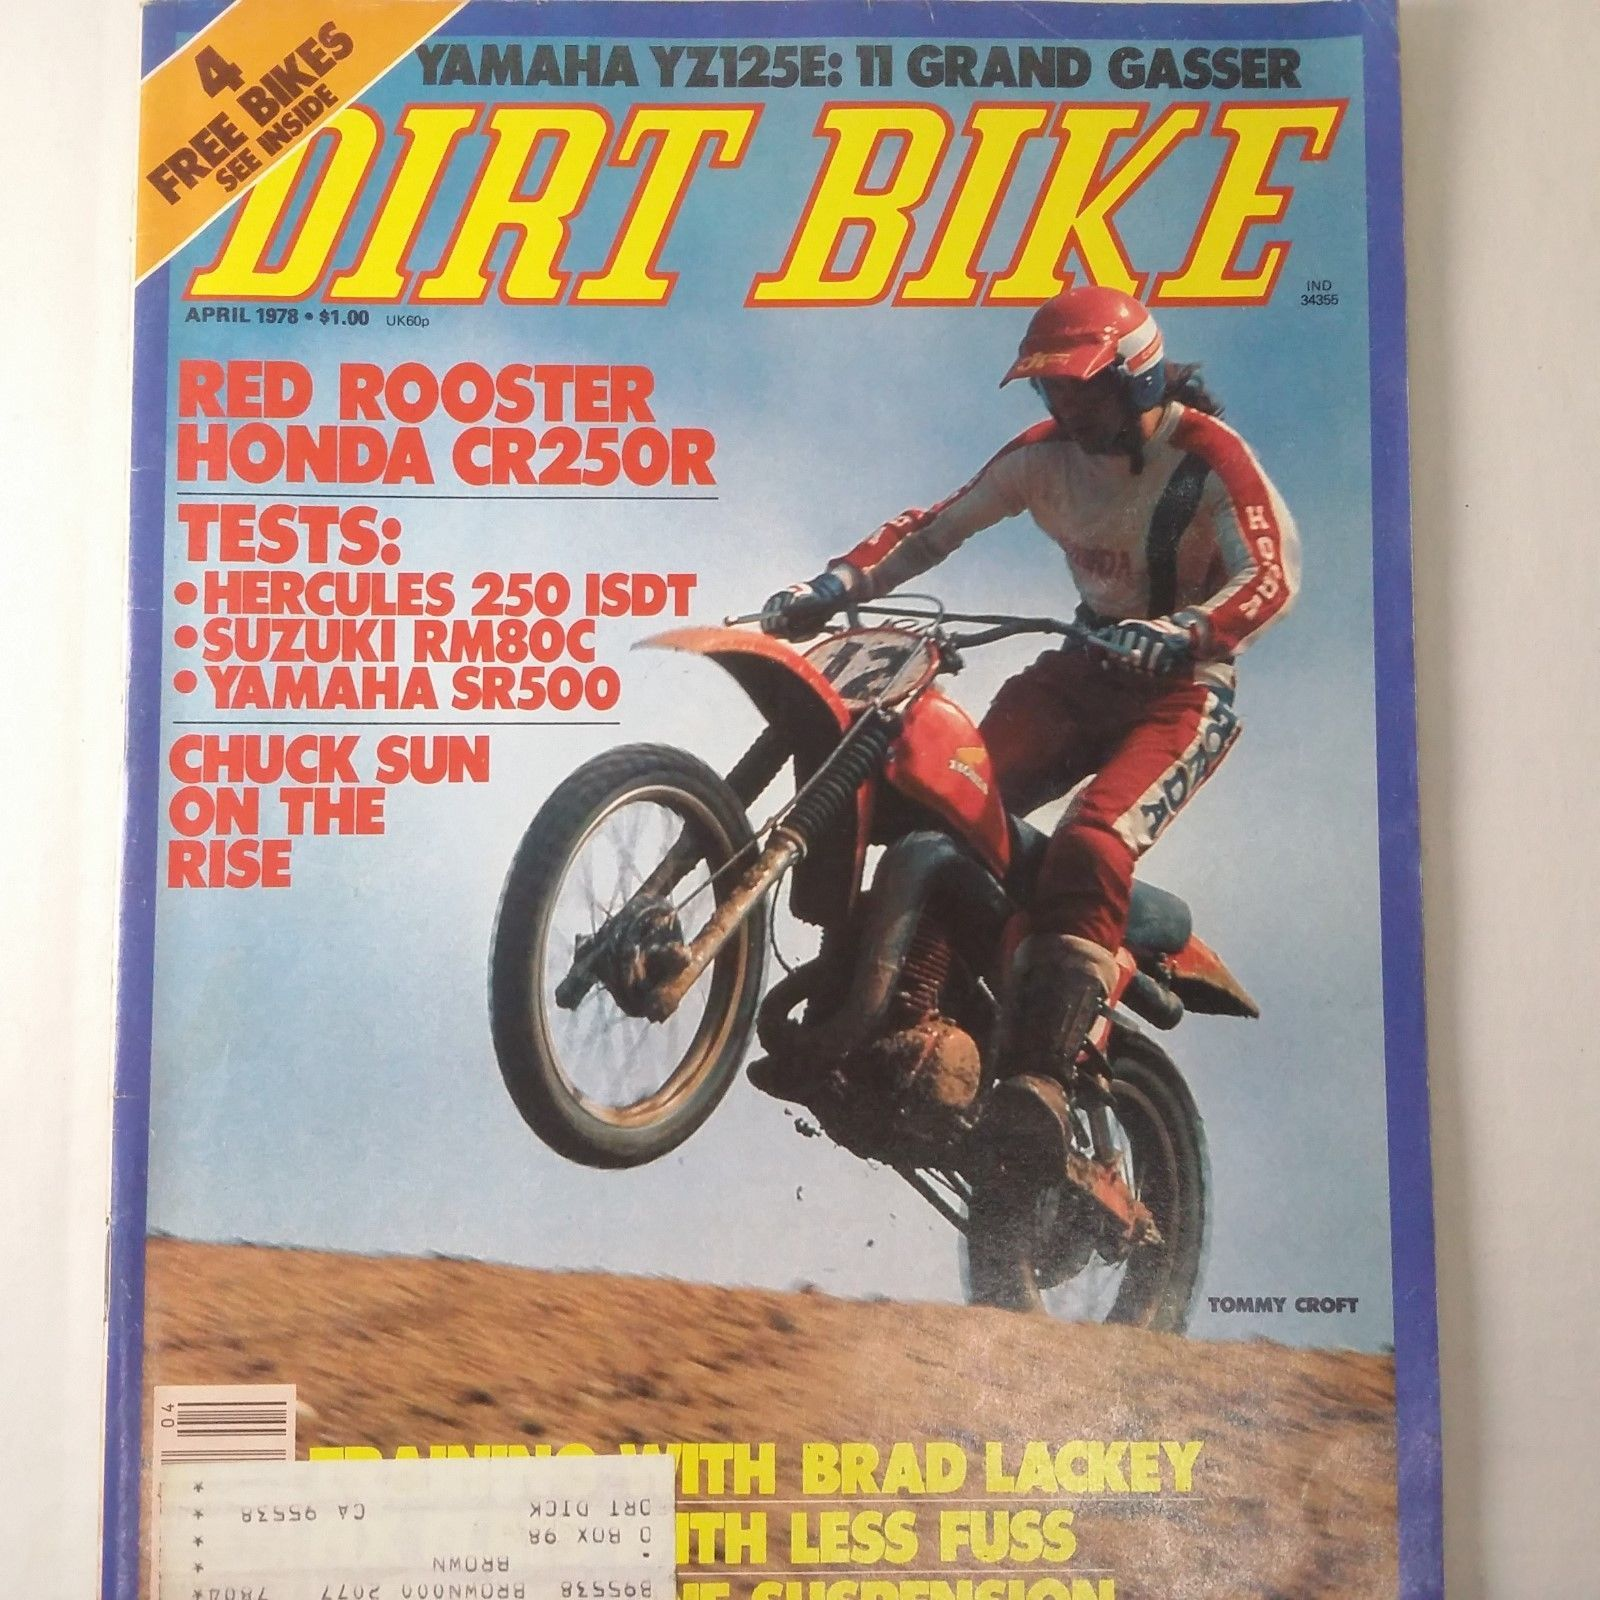 Rare dirt bike magazine april 1978 yamaha yz125e honda cr250r rare dirt bike magazine april 1978 yamaha yz125e honda cr250r ebay publicscrutiny Choice Image